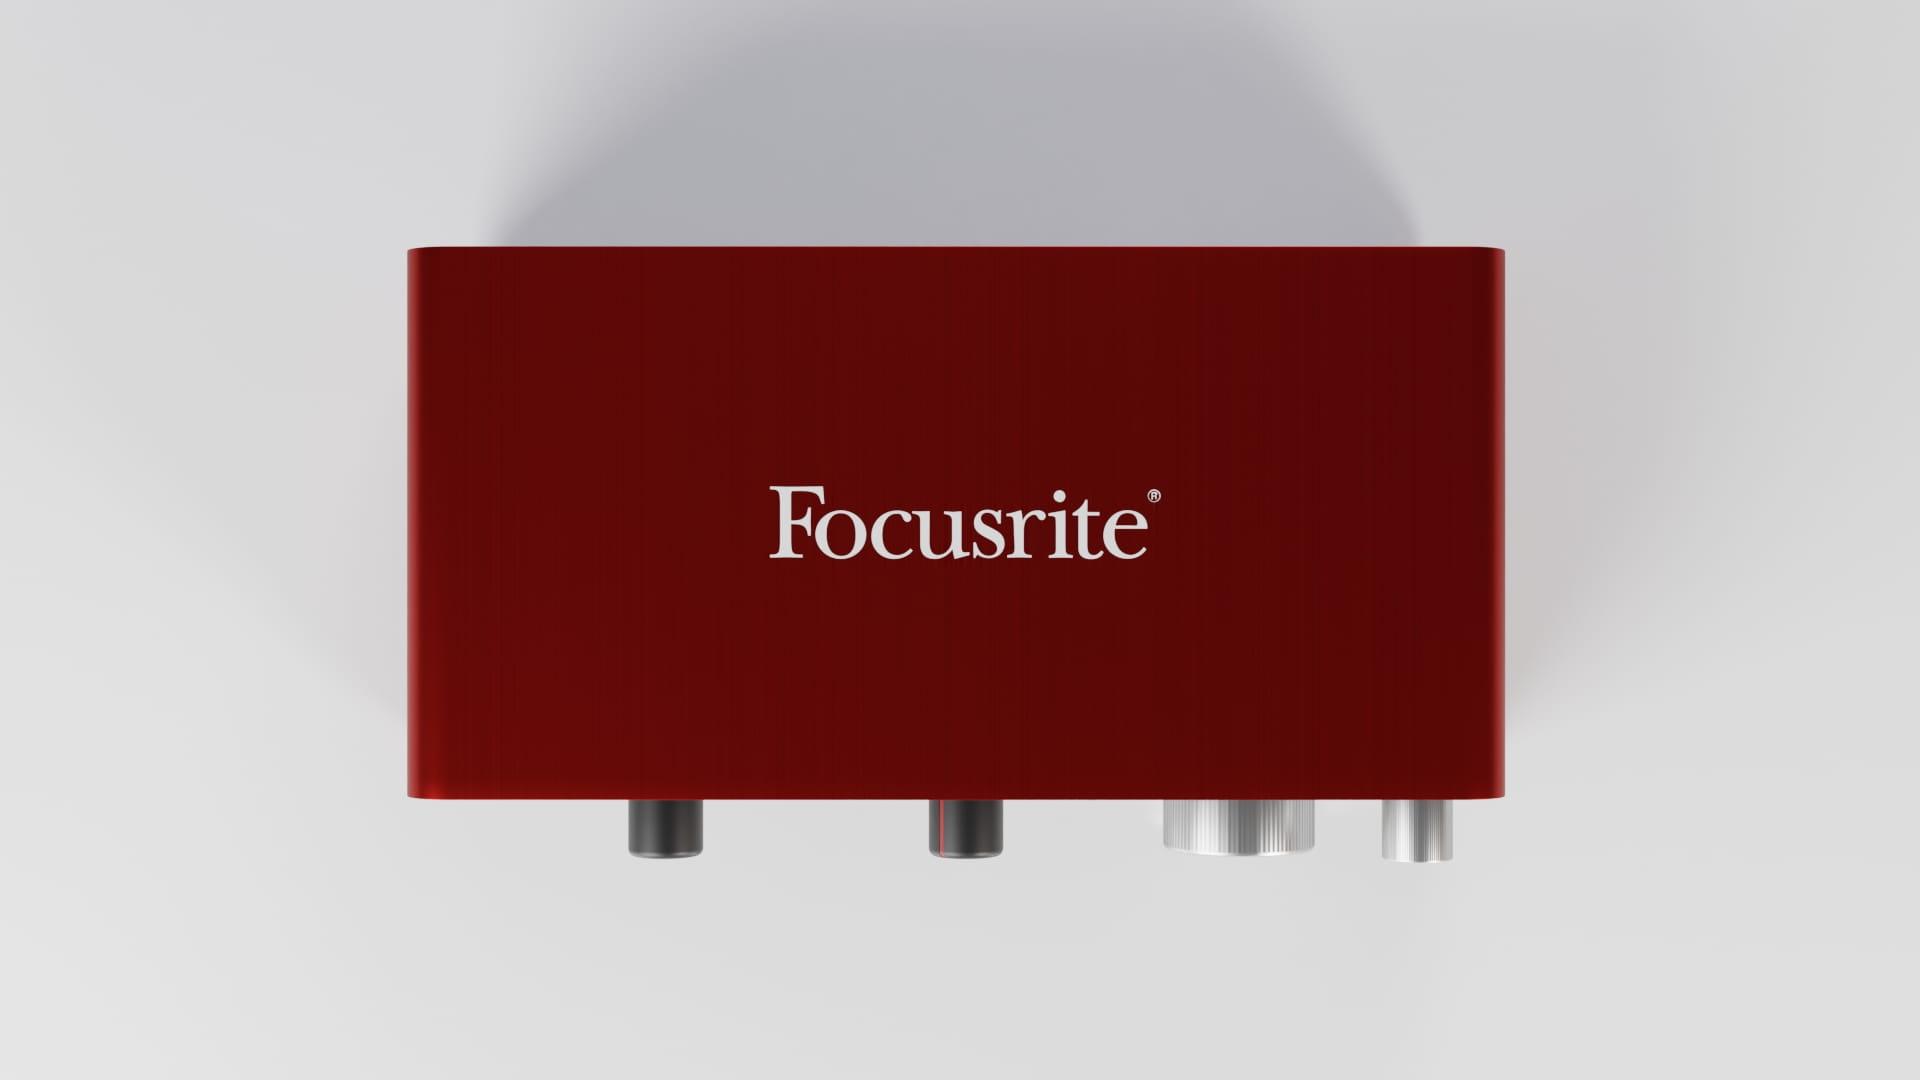 Model 3d Focusrite Scarlett 2i2 zaprojektowany w Blender 2.8 - Top